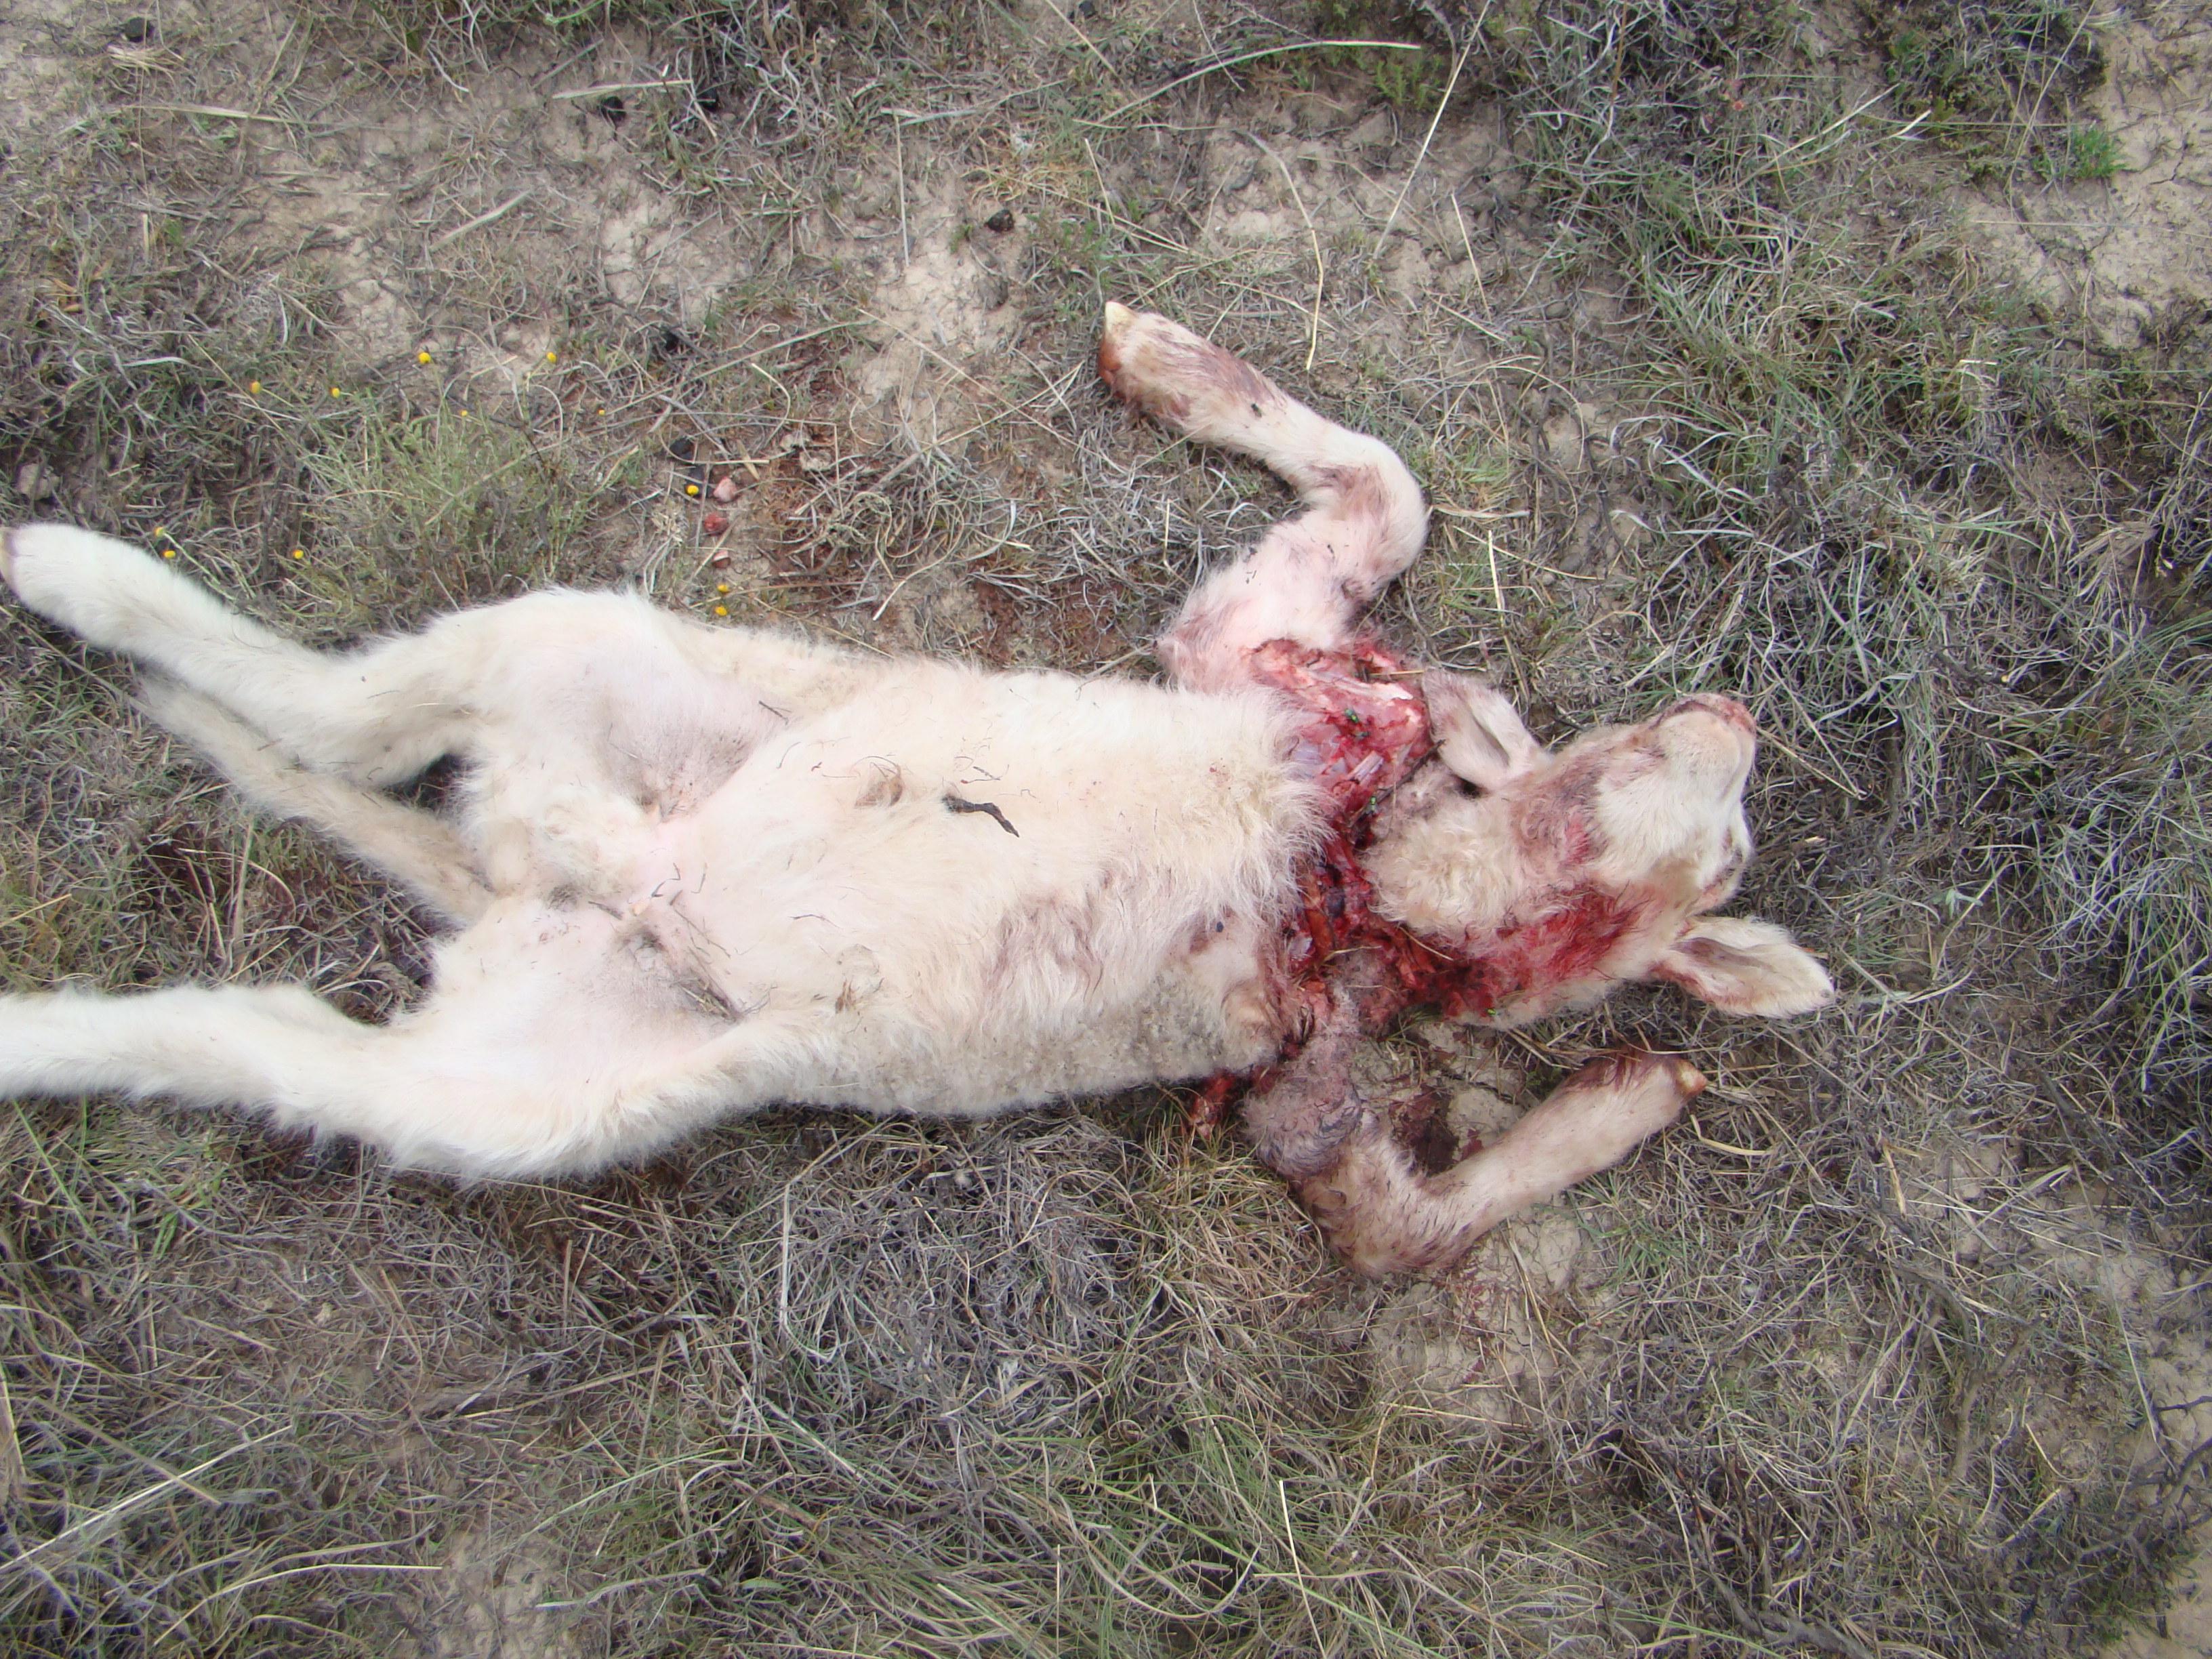 Predator problem (visuals) gruesome | freestatesheepdogs